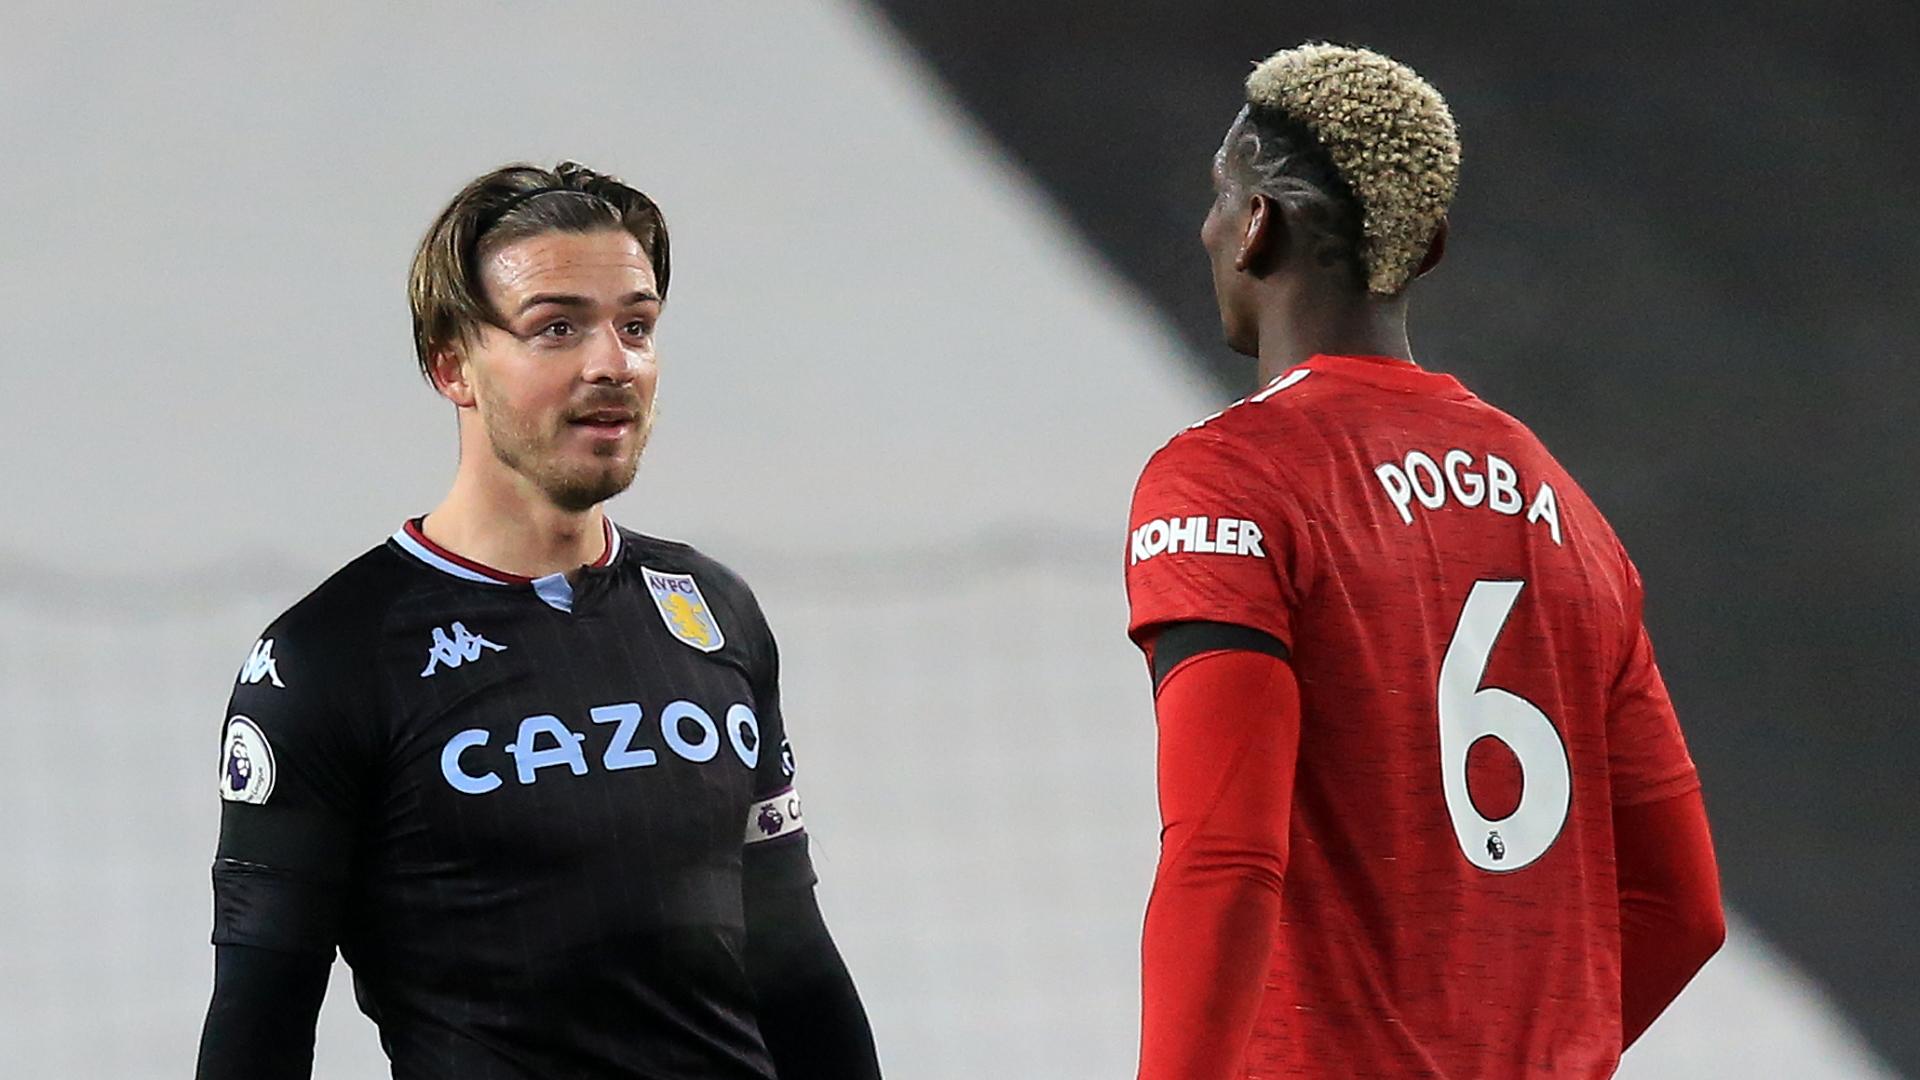 I don't care if Pogba leaves Man Utd, Grealish is my man! - Ferdinand